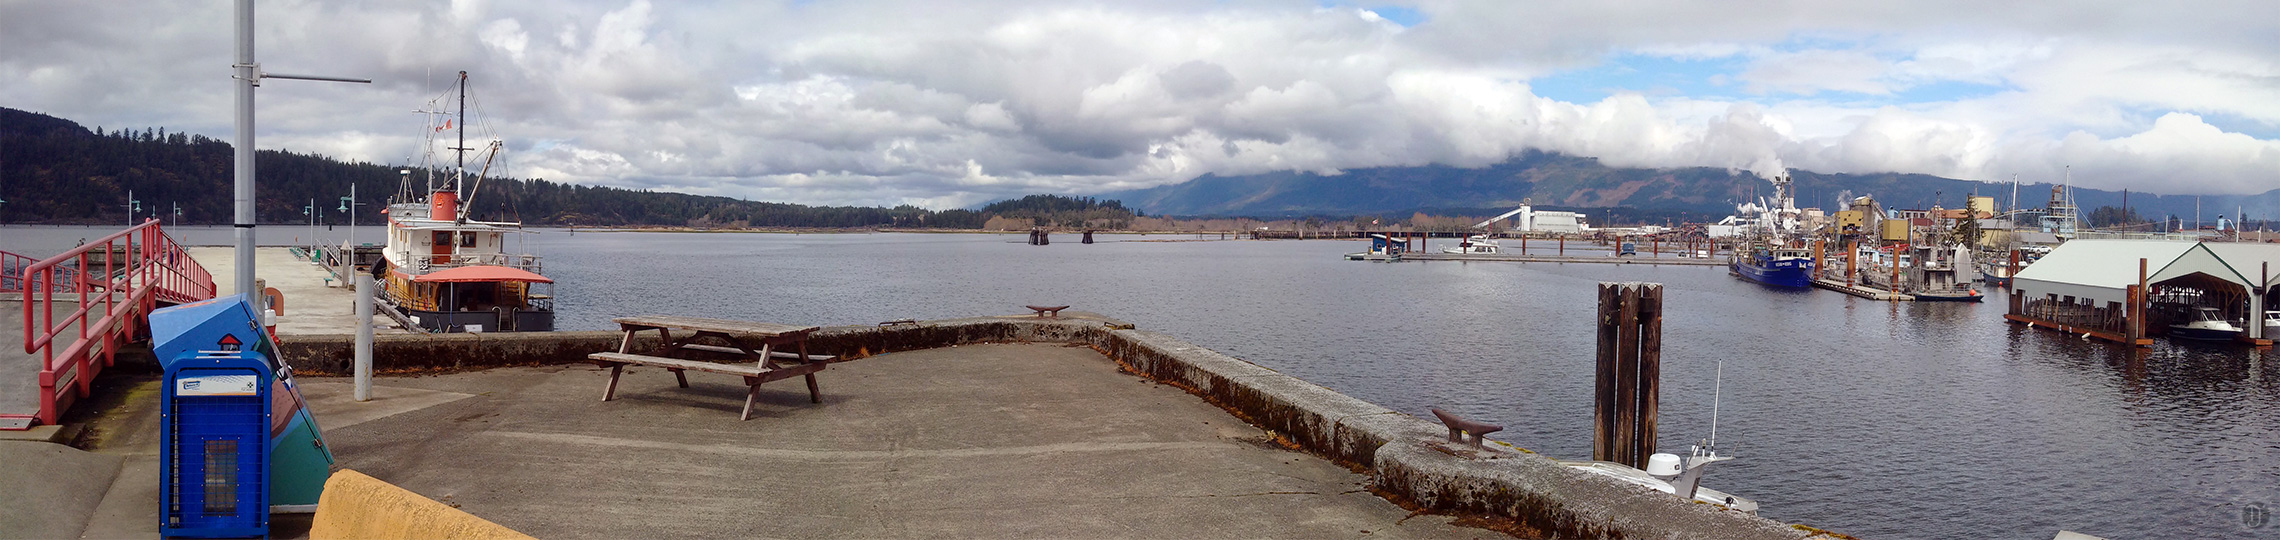 Port Alberni Harbour Panorama